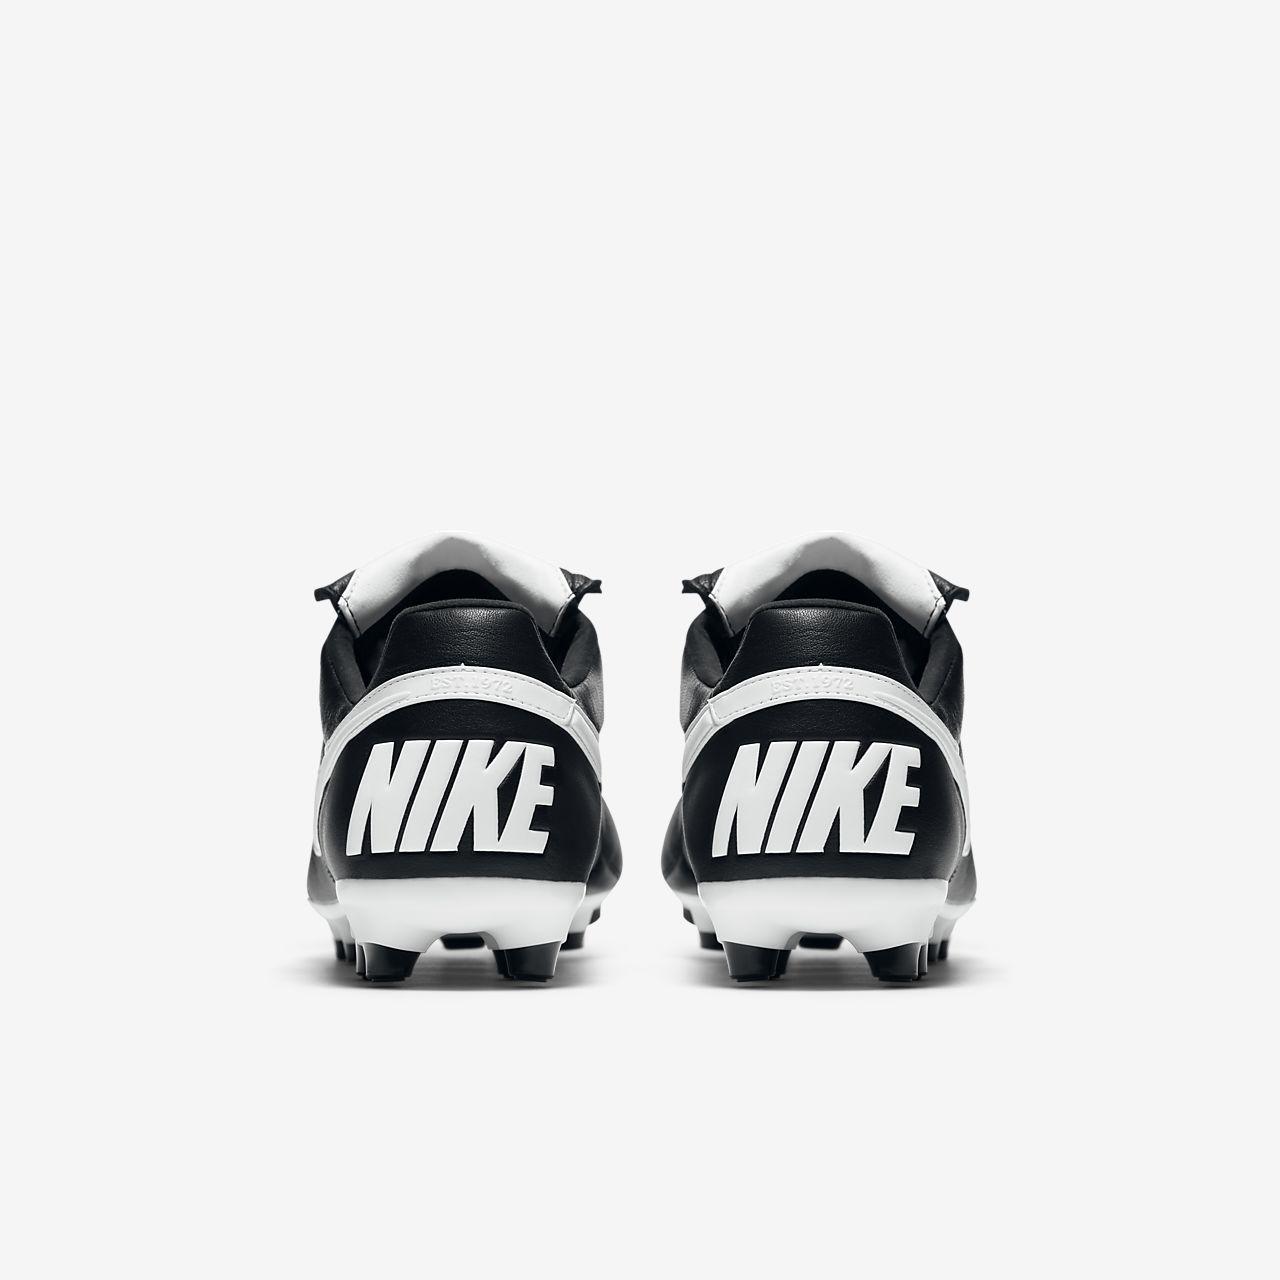 4a0db0880 nike soccer com on sale   OFF36% Discounts